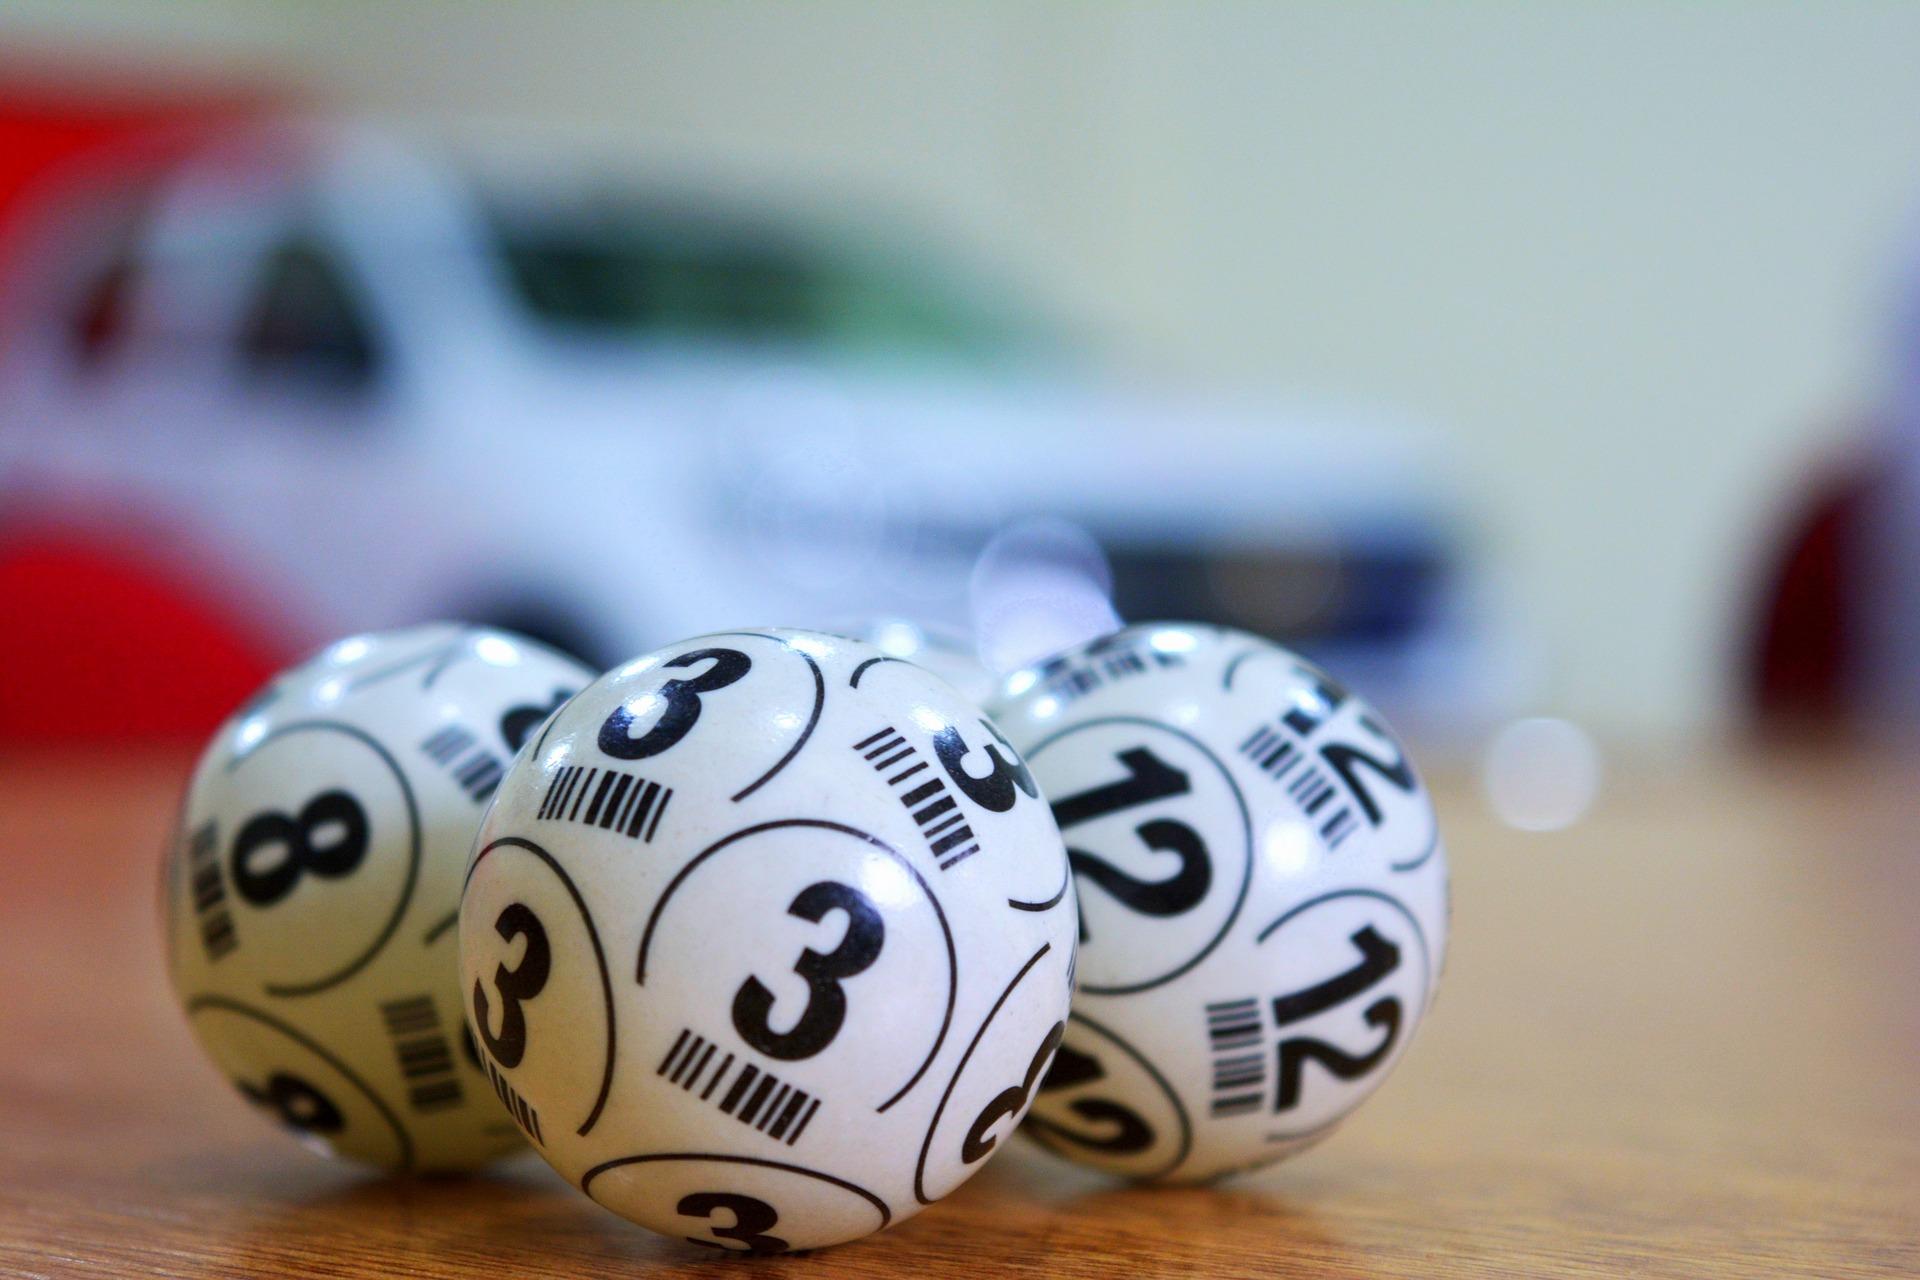 receipt lottery fiscalization fiscalisation scontrino lotteria